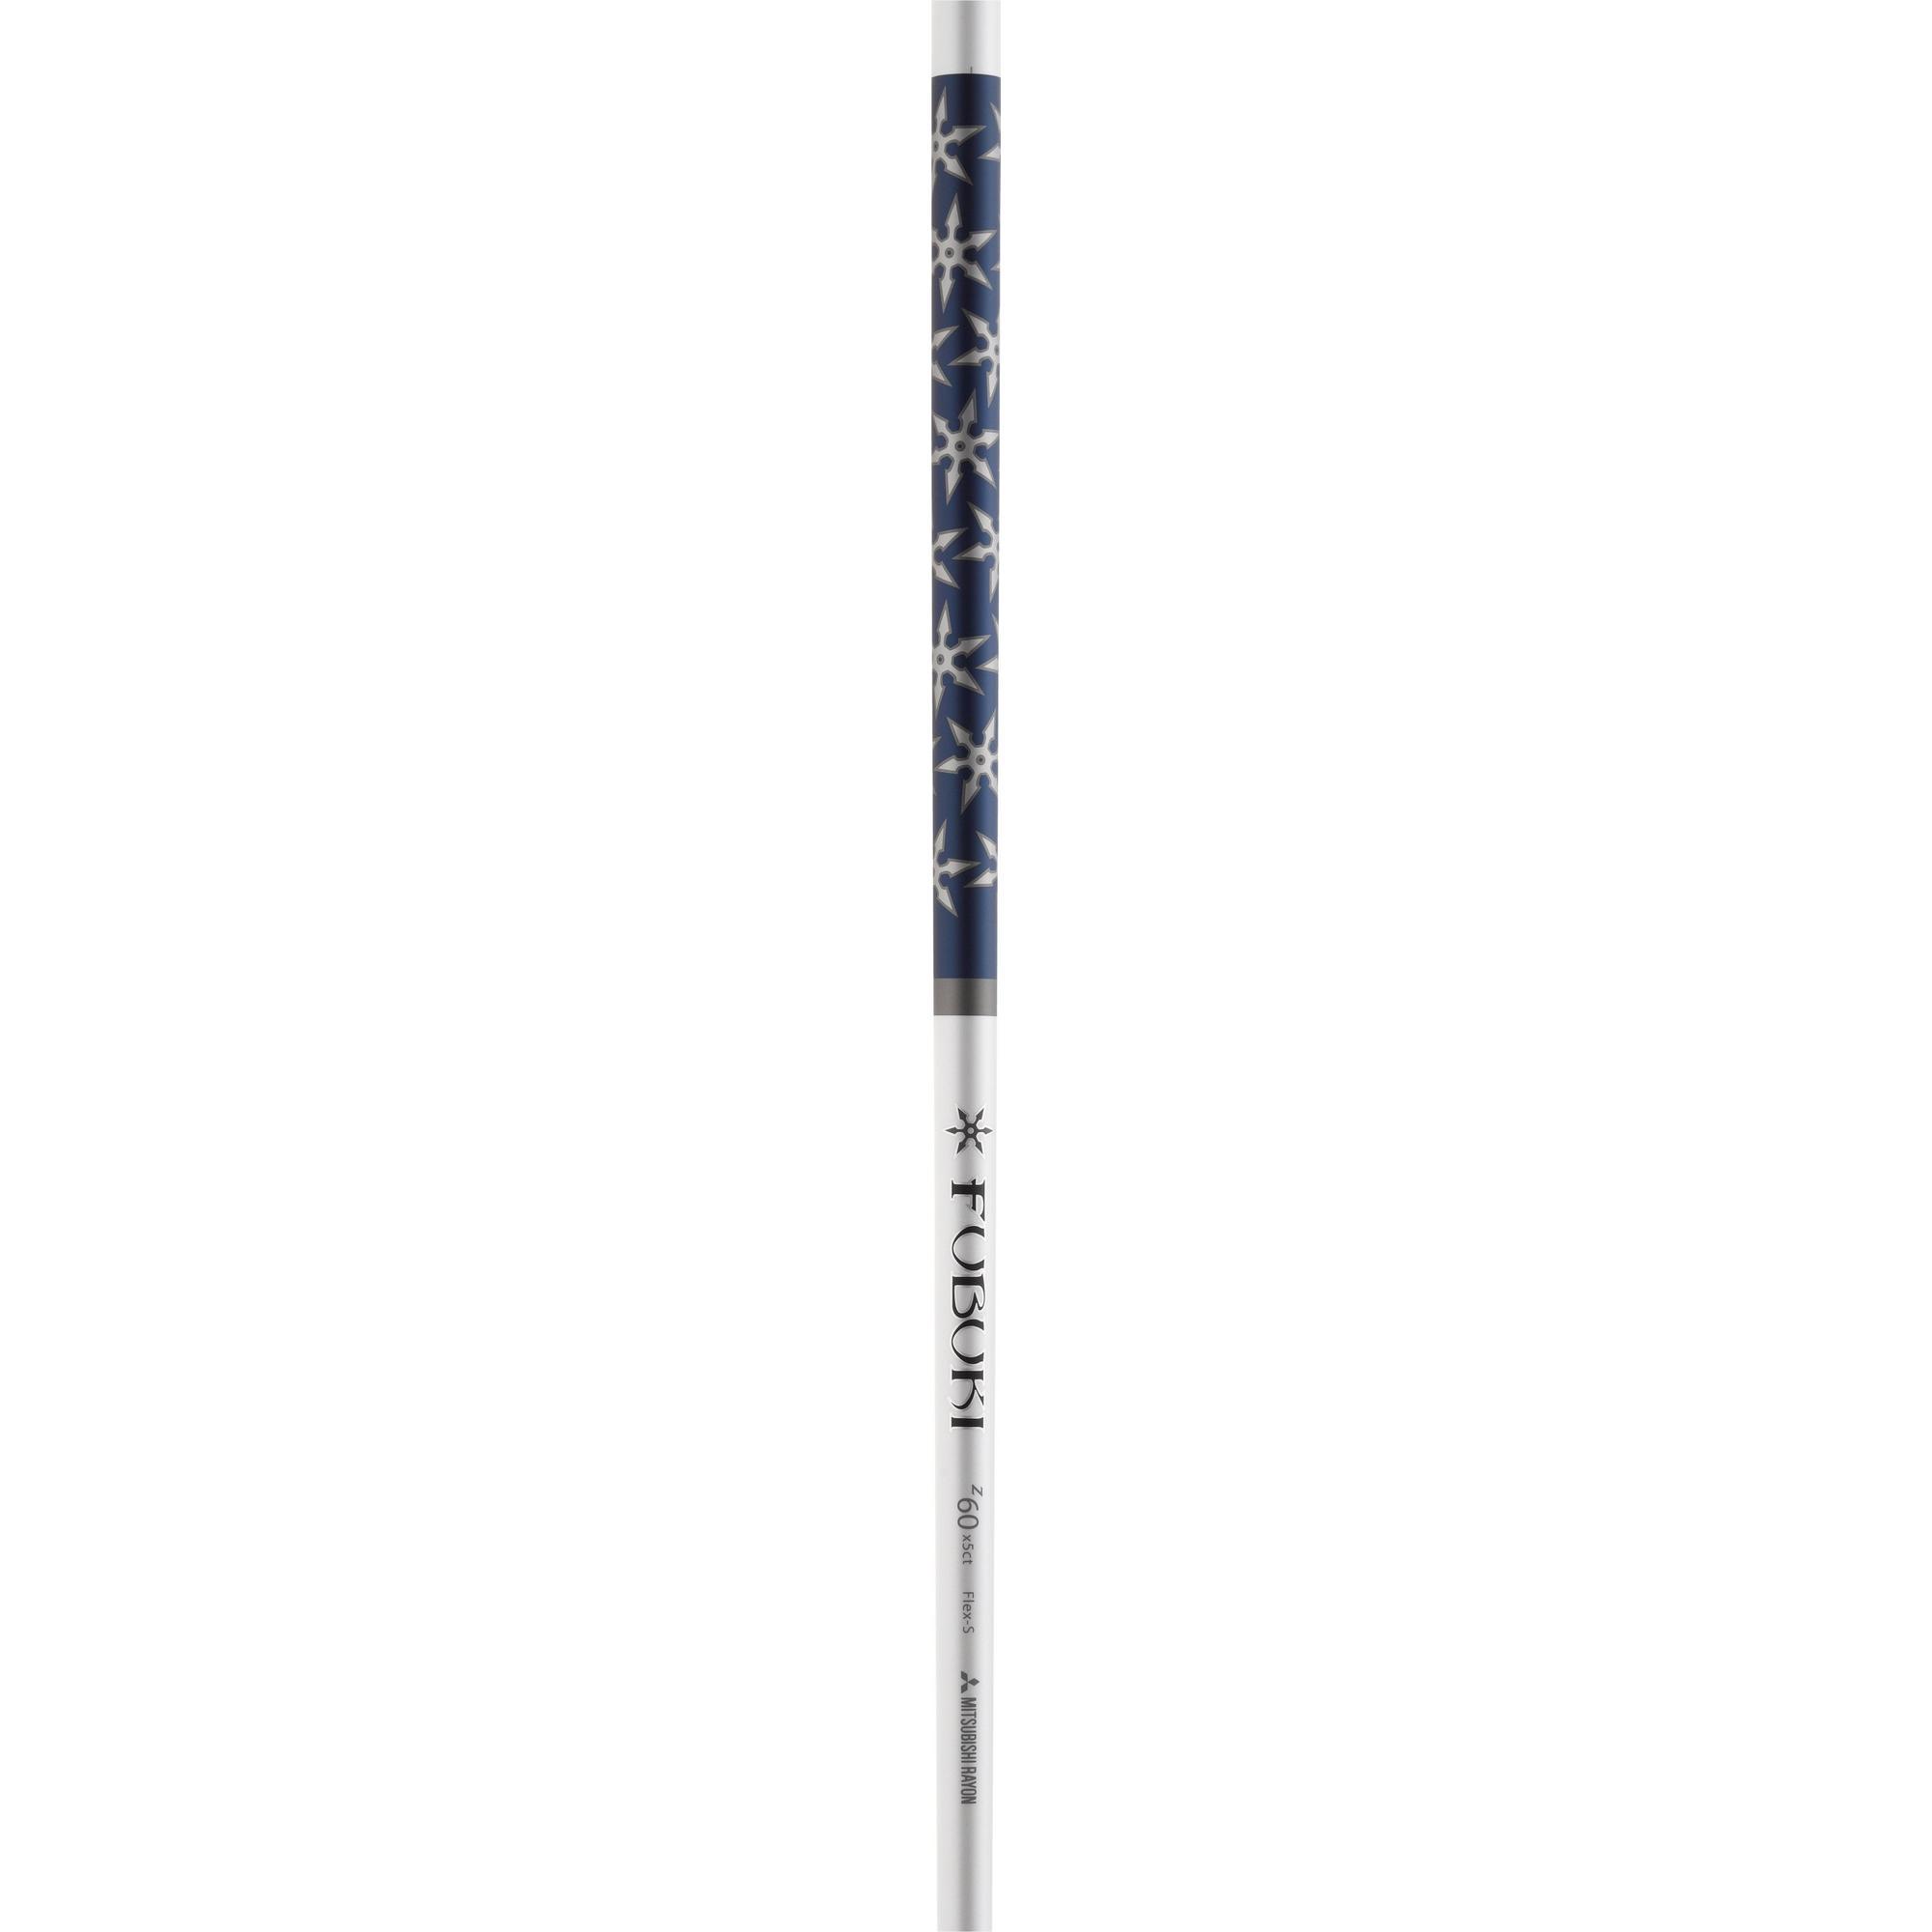 Fubuki Z 50 .335 Graphite Wood Shaft